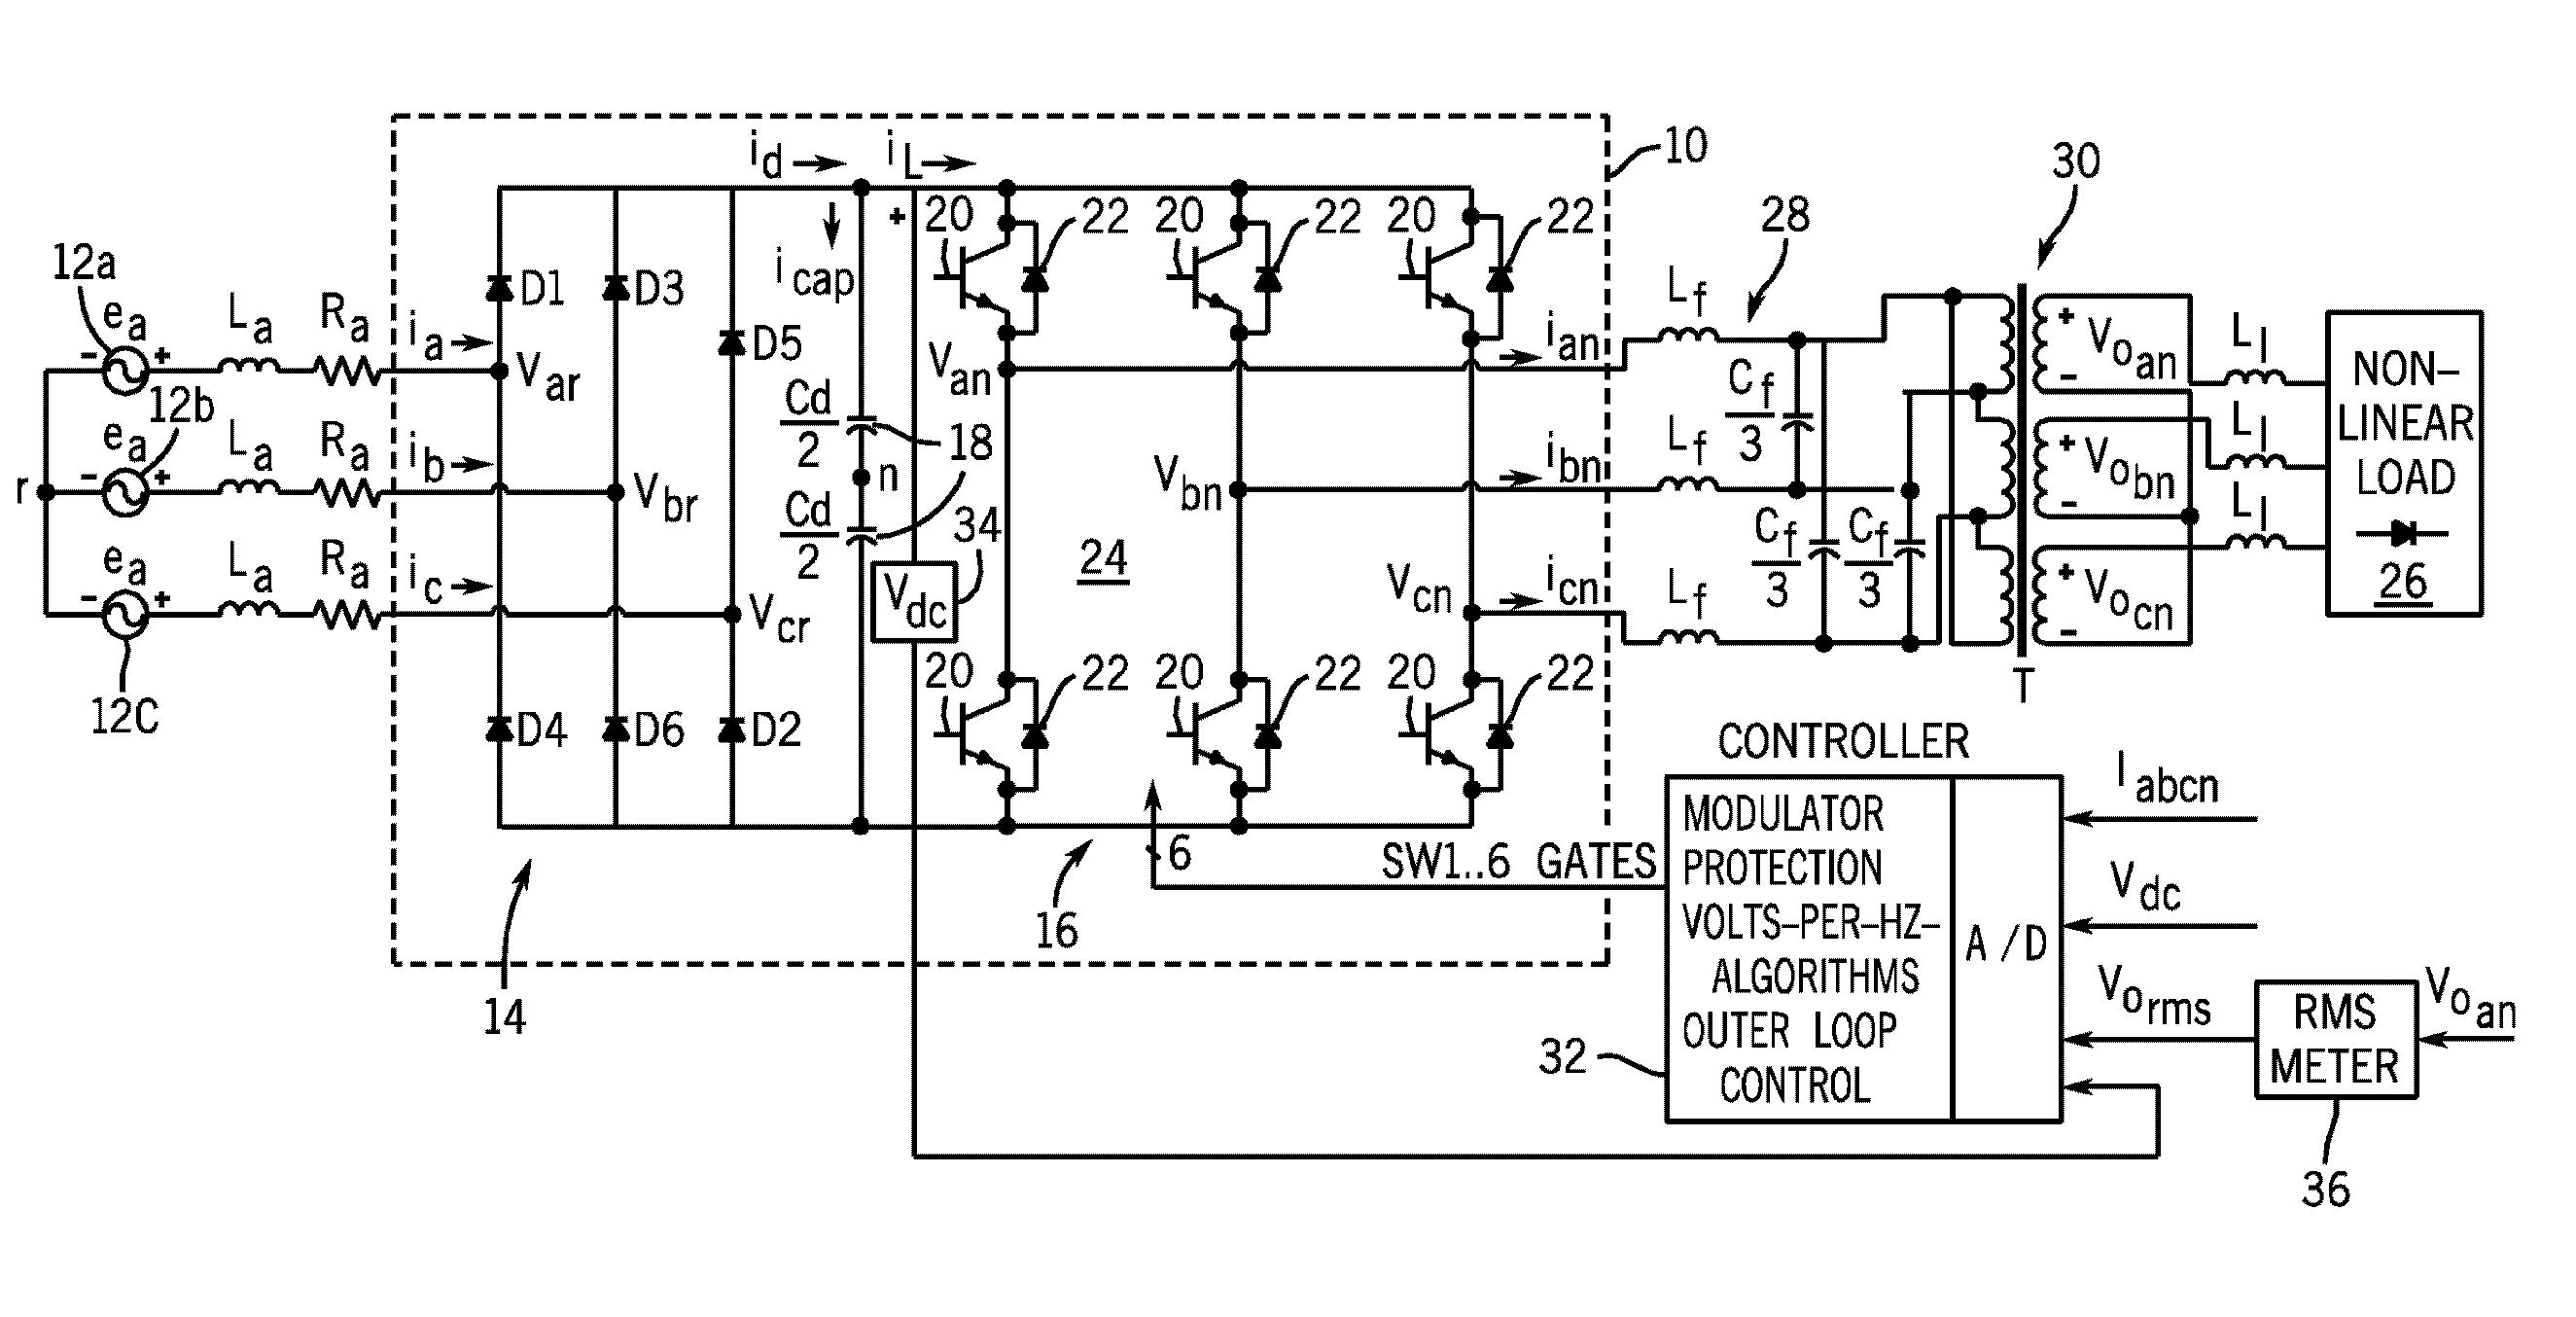 Ac Motor Wiring Diagram. Wiring. Wiring Diagrams Instructions